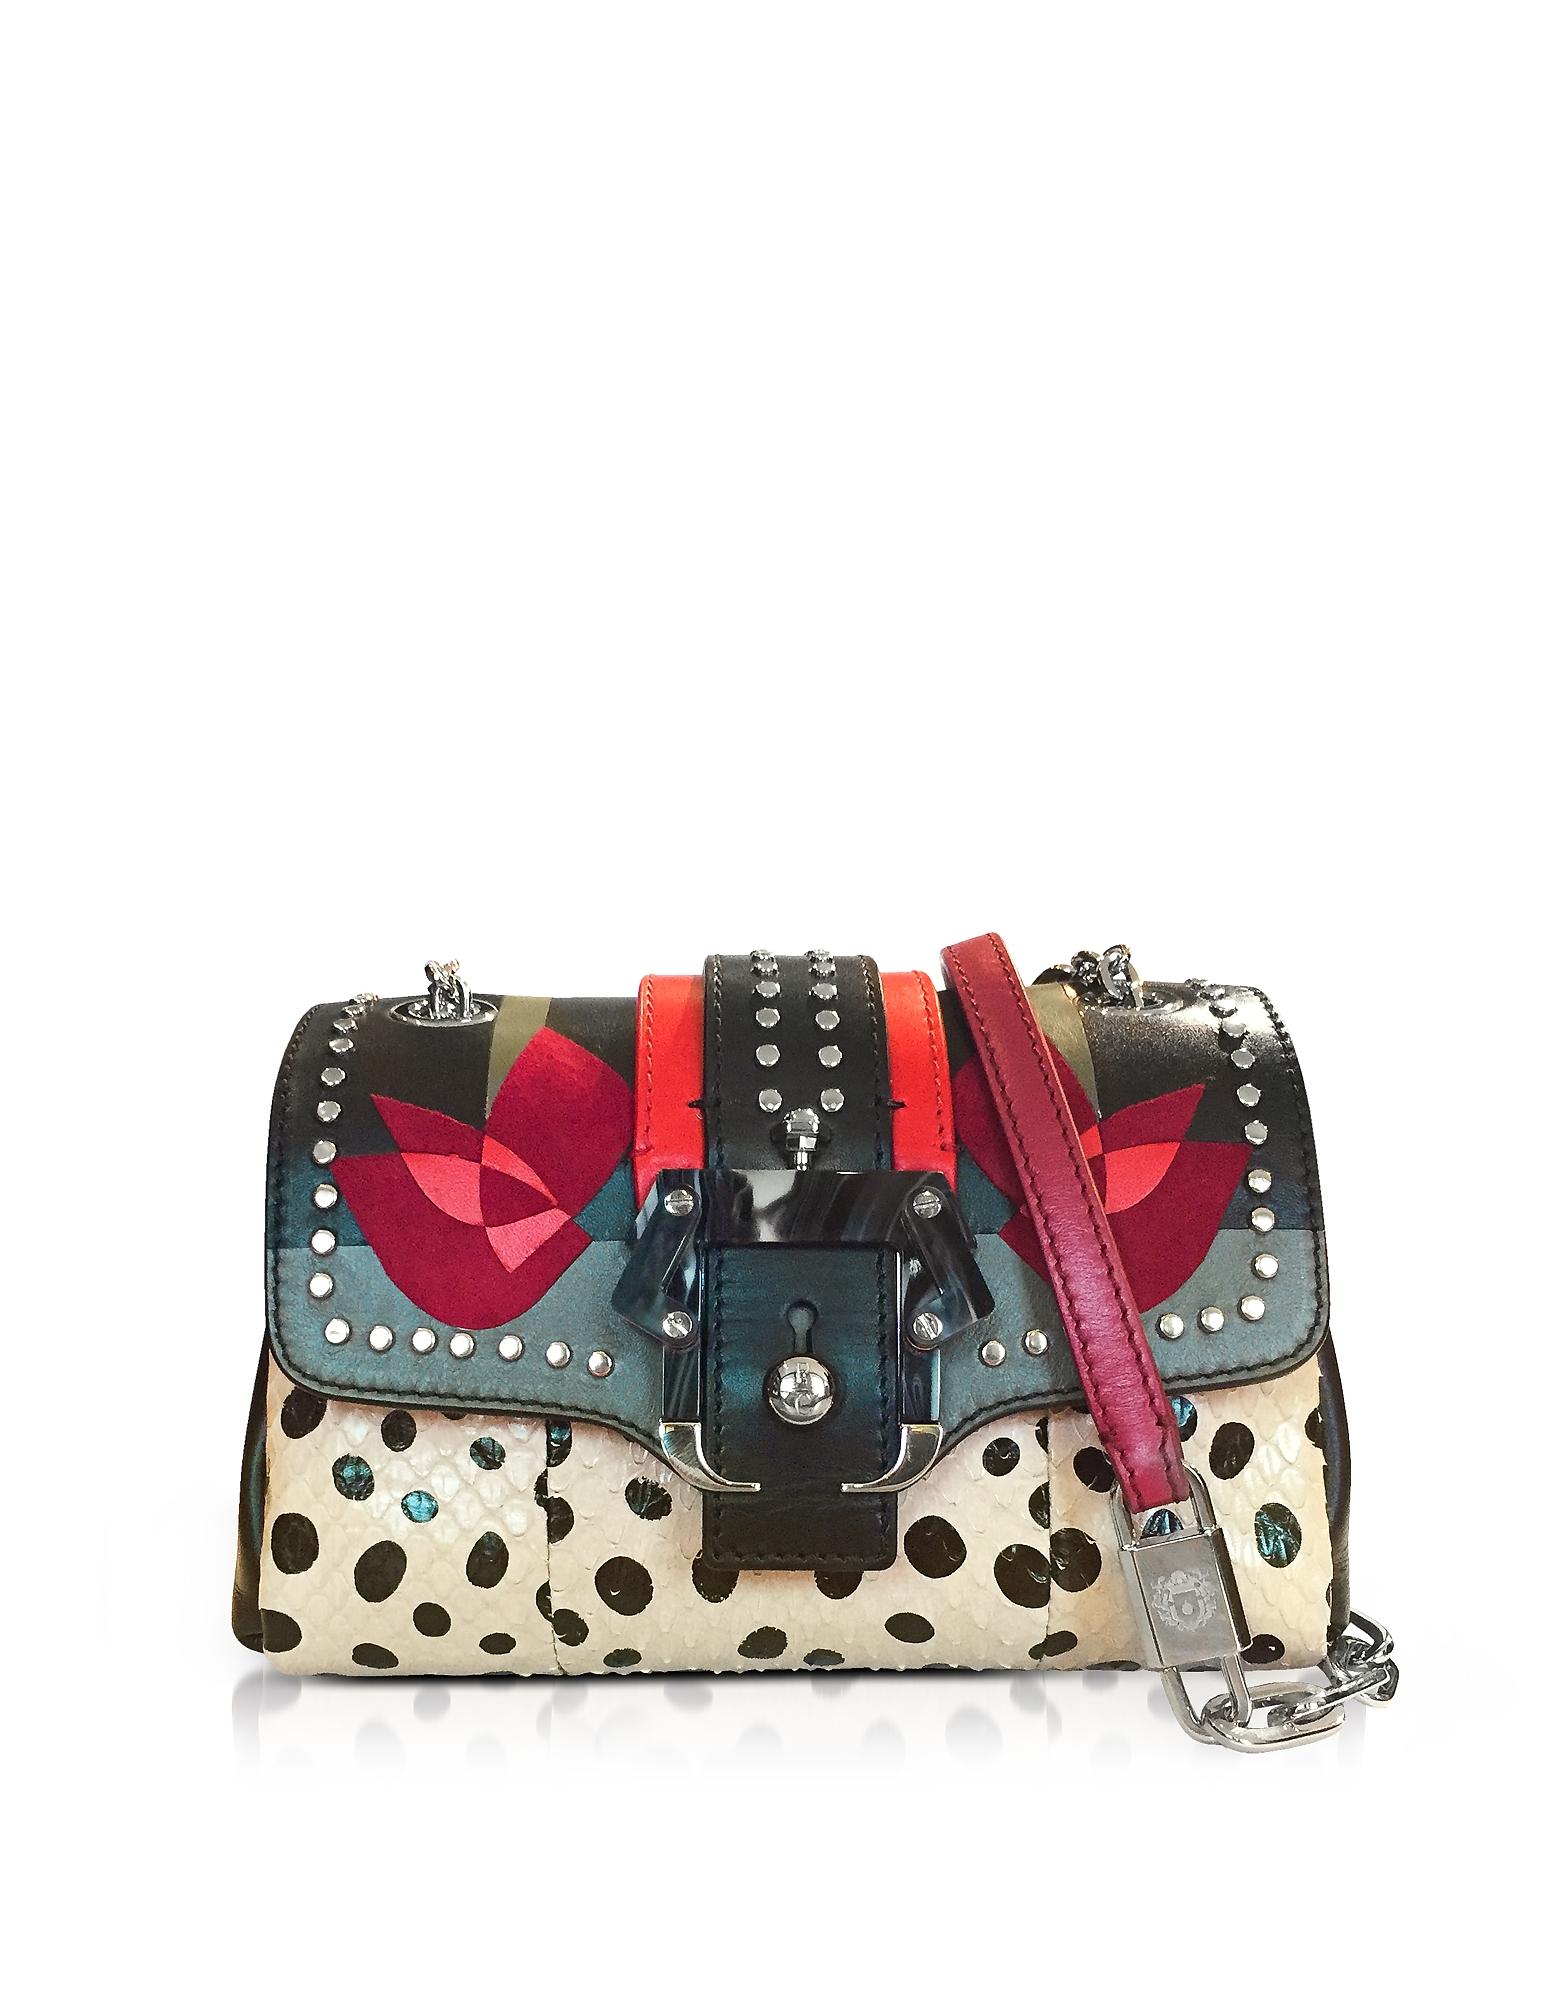 Multicolor Leather Kaia Love Shoulder Bag